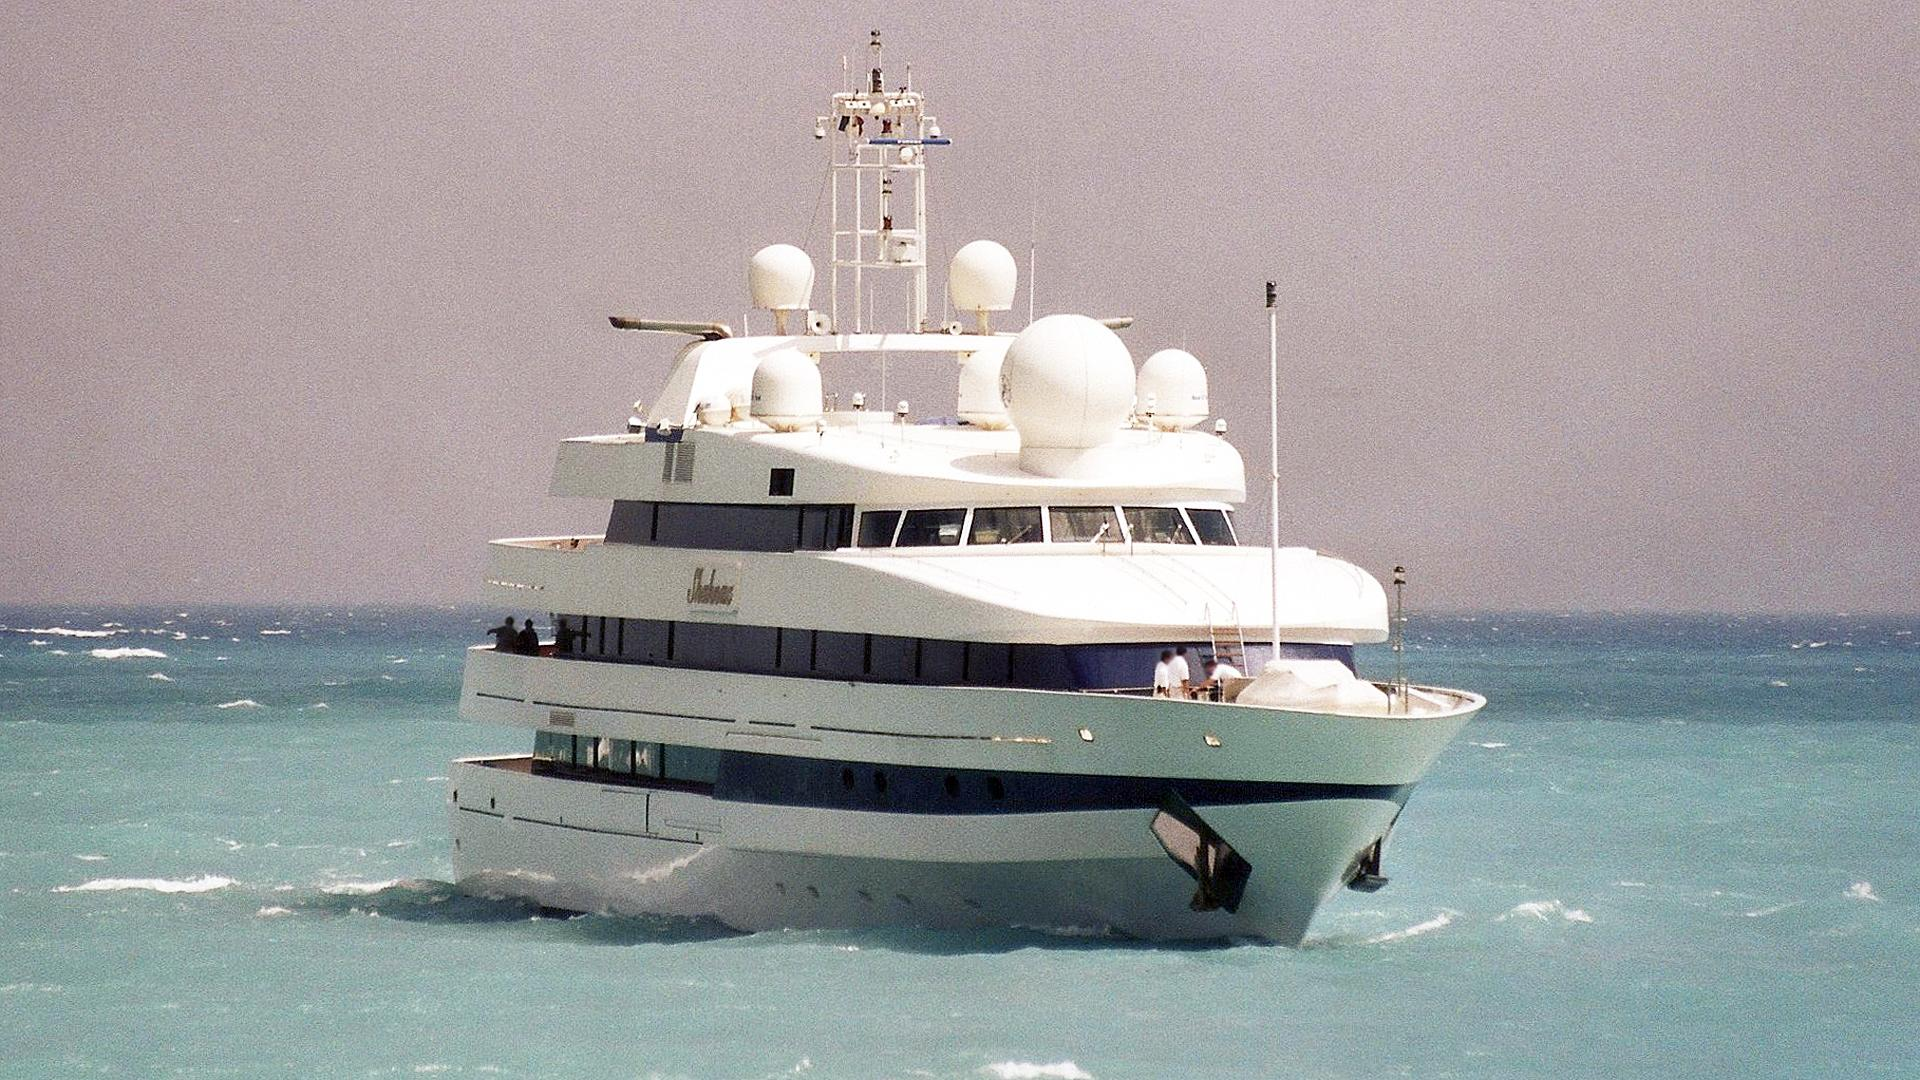 shahnaz-motor-yacht-nuovi-ligori-1991-63m-bow